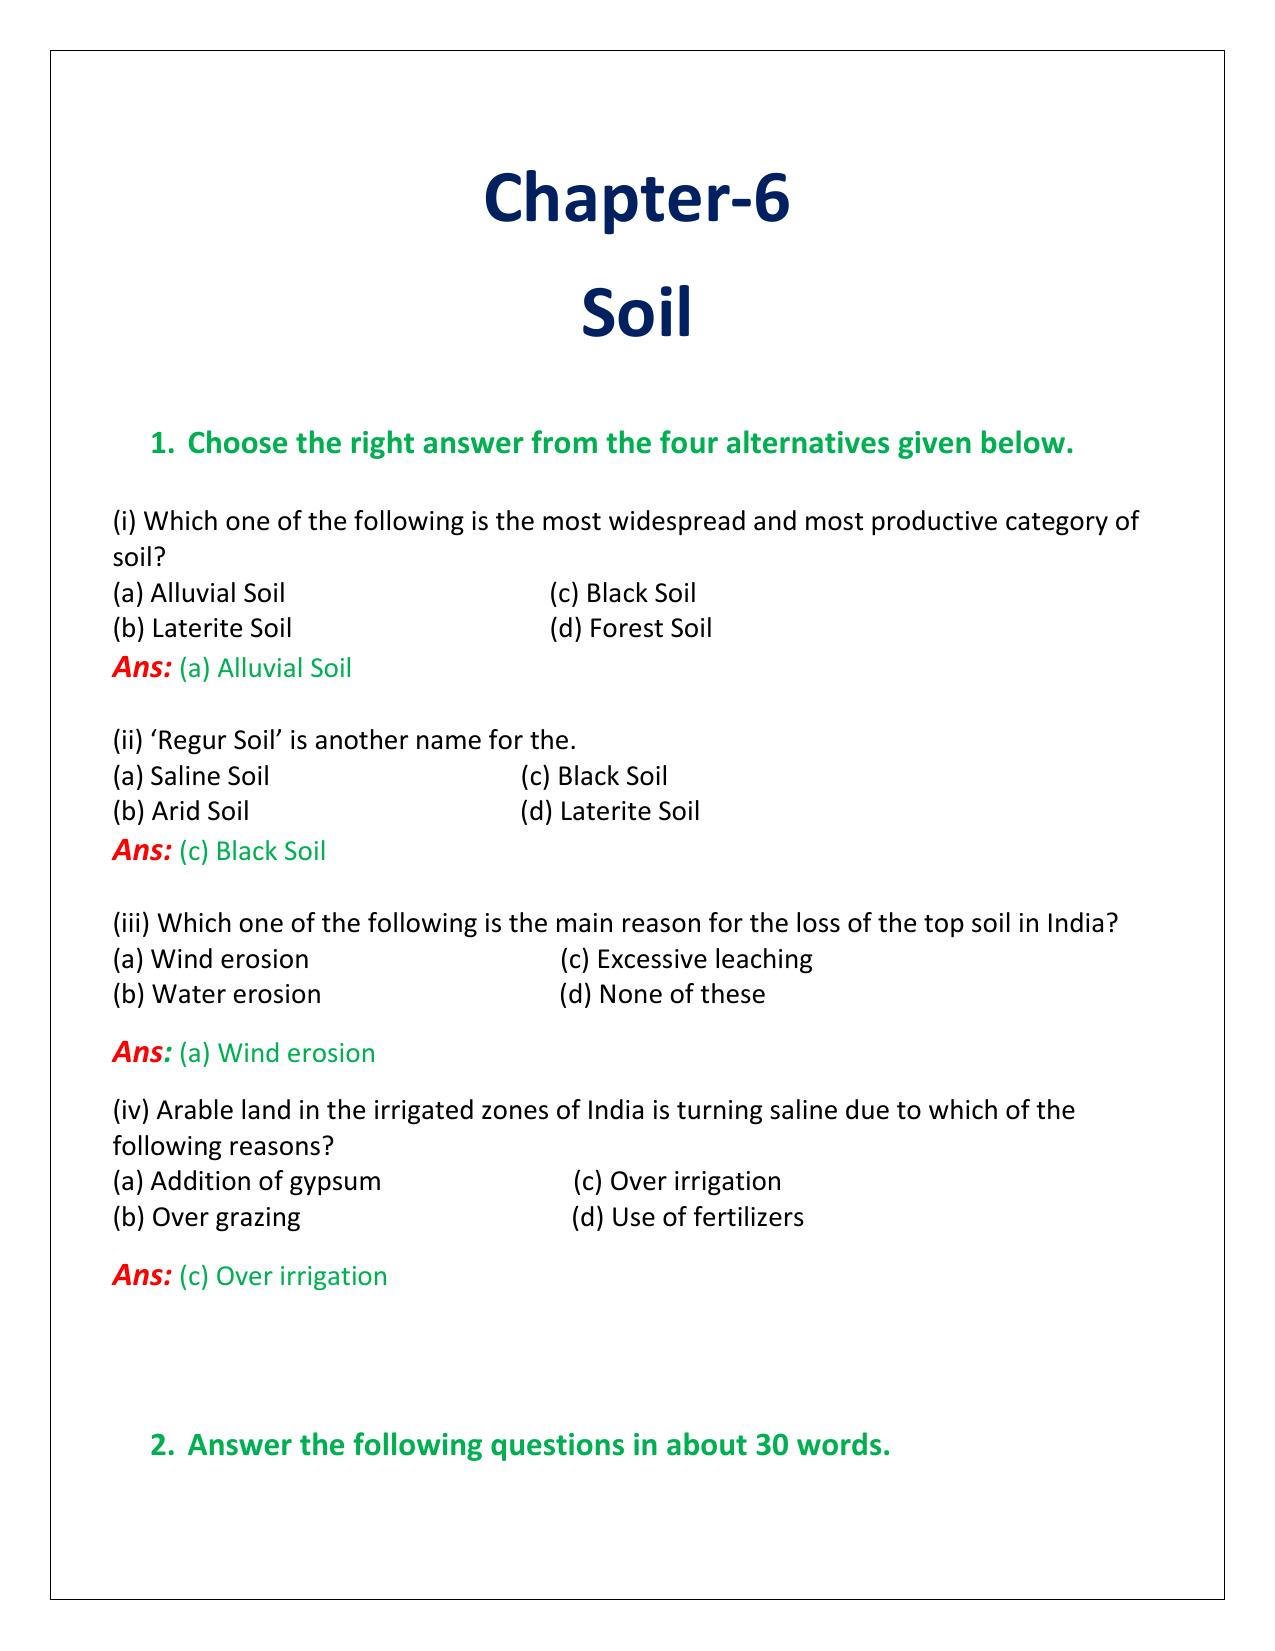 arid soil in india